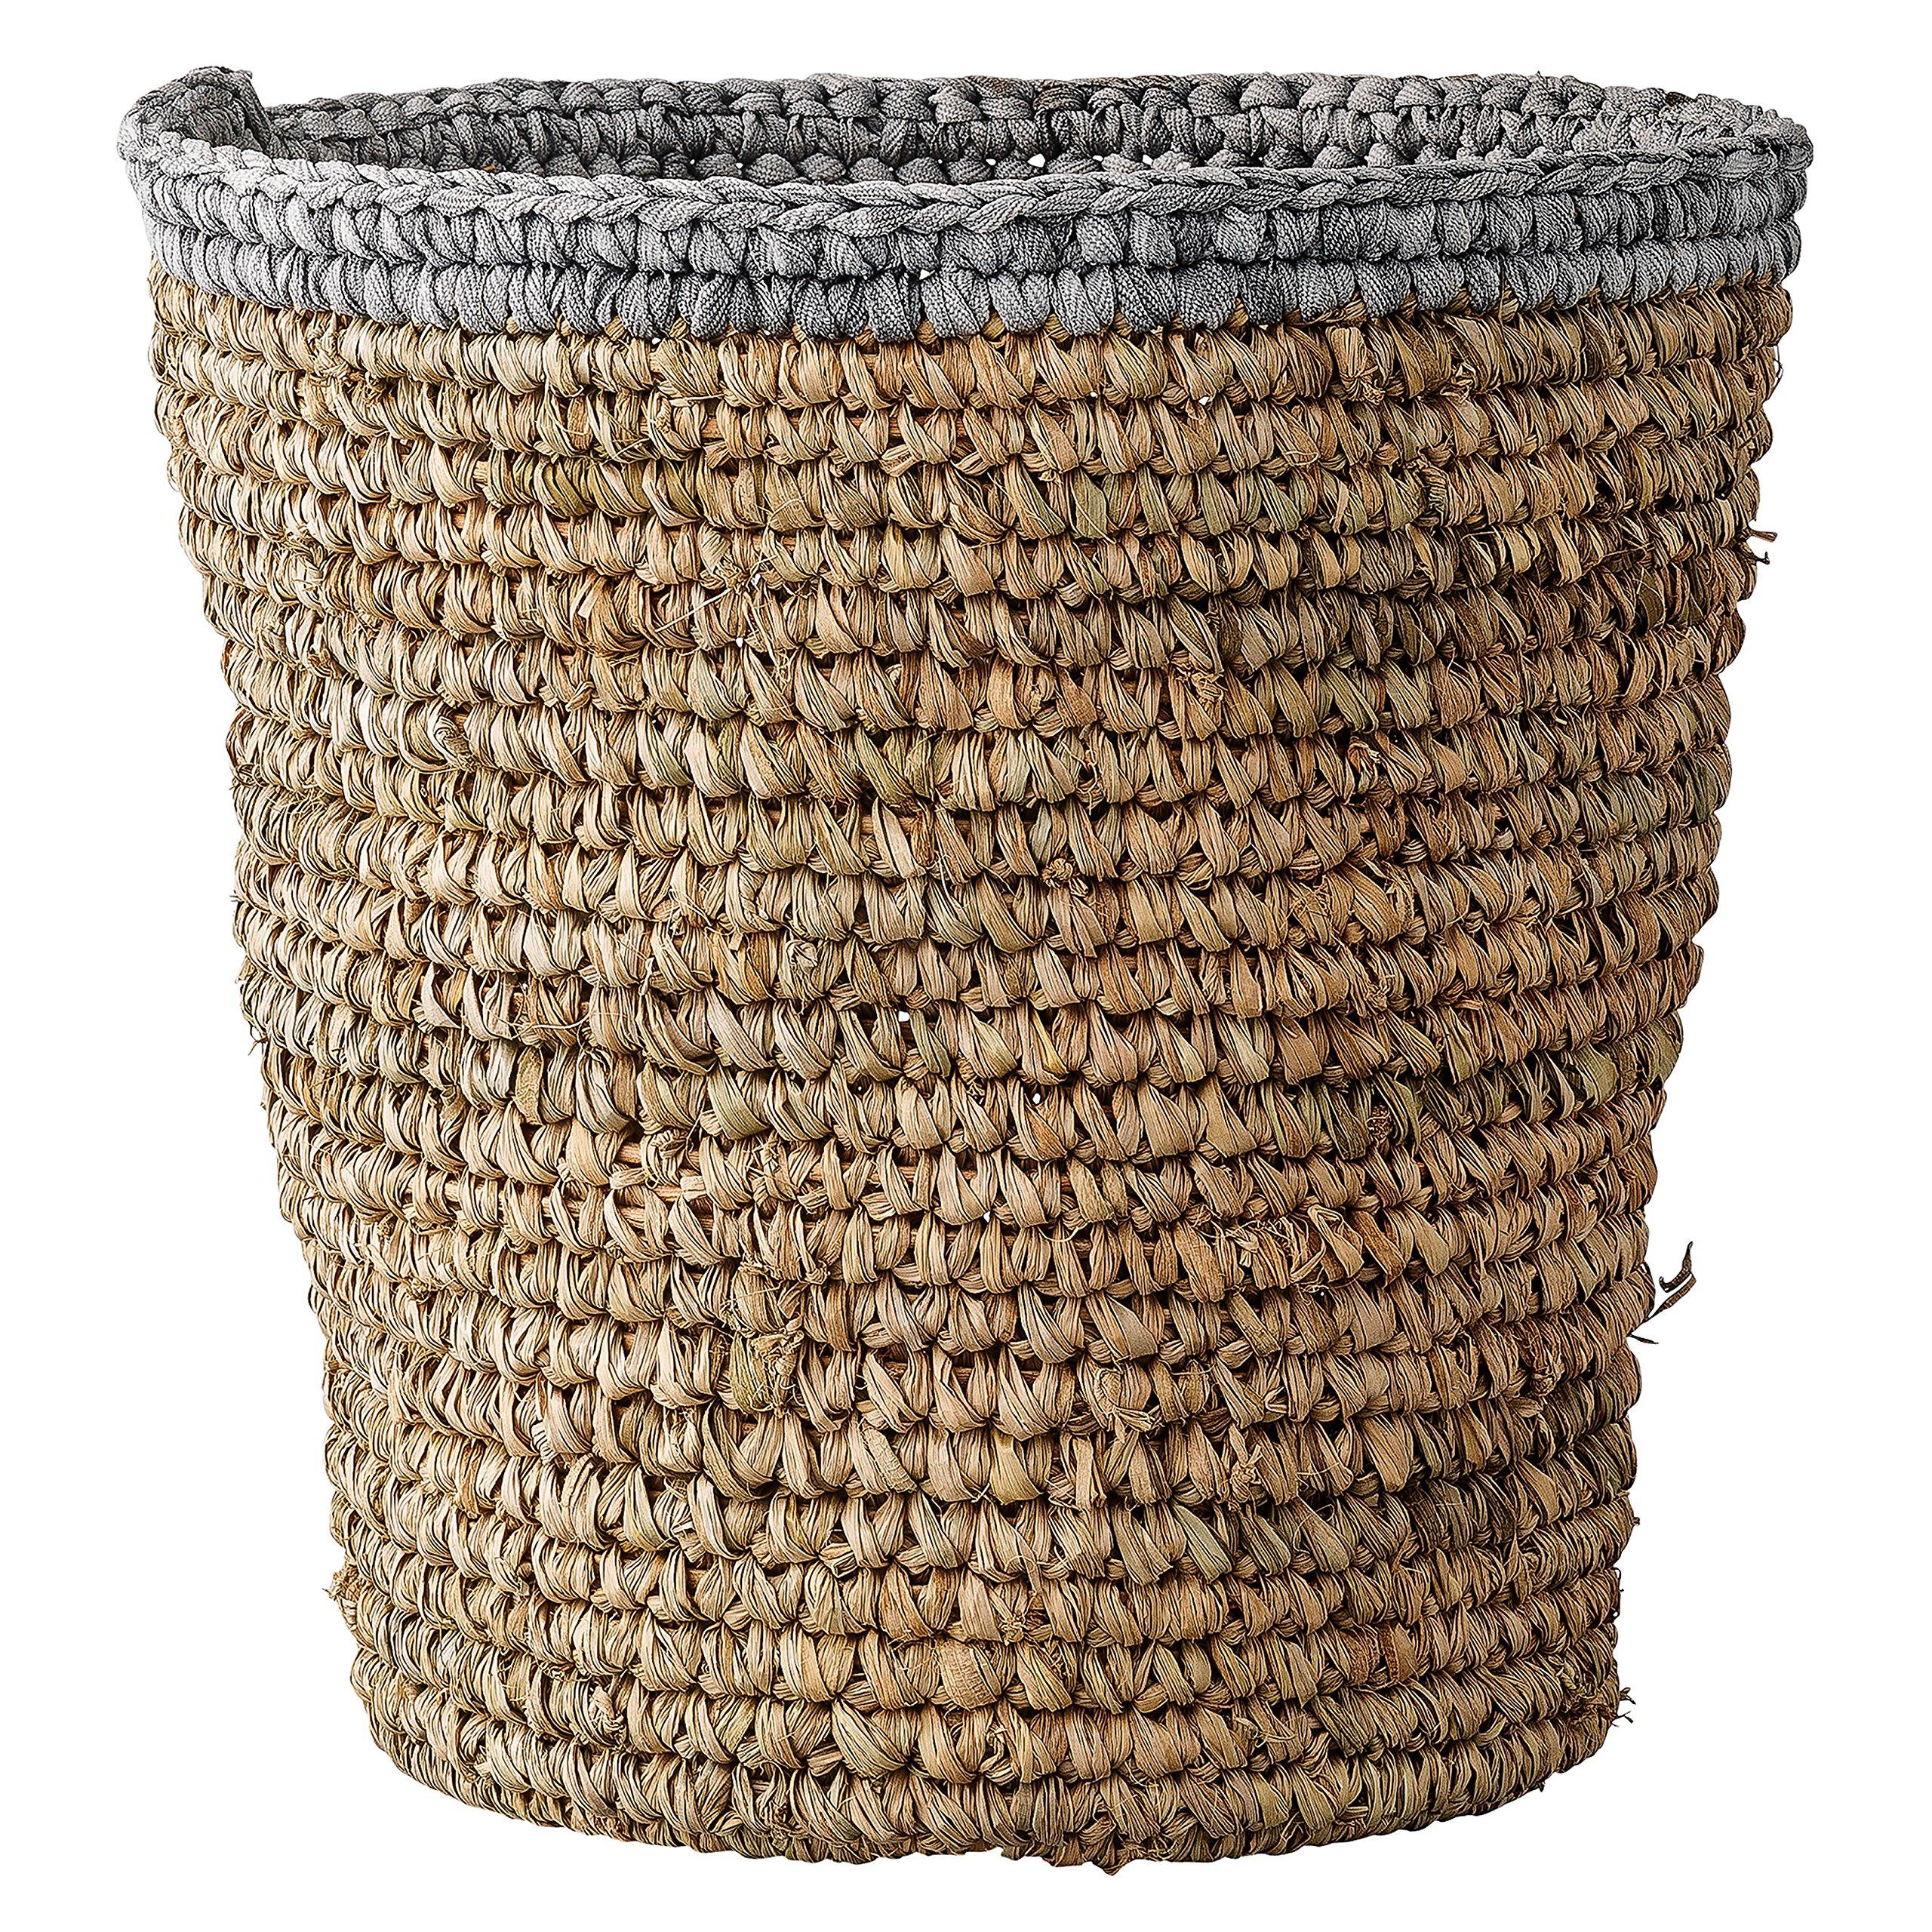 Bloomingville Raffia Basket with Grey Edge